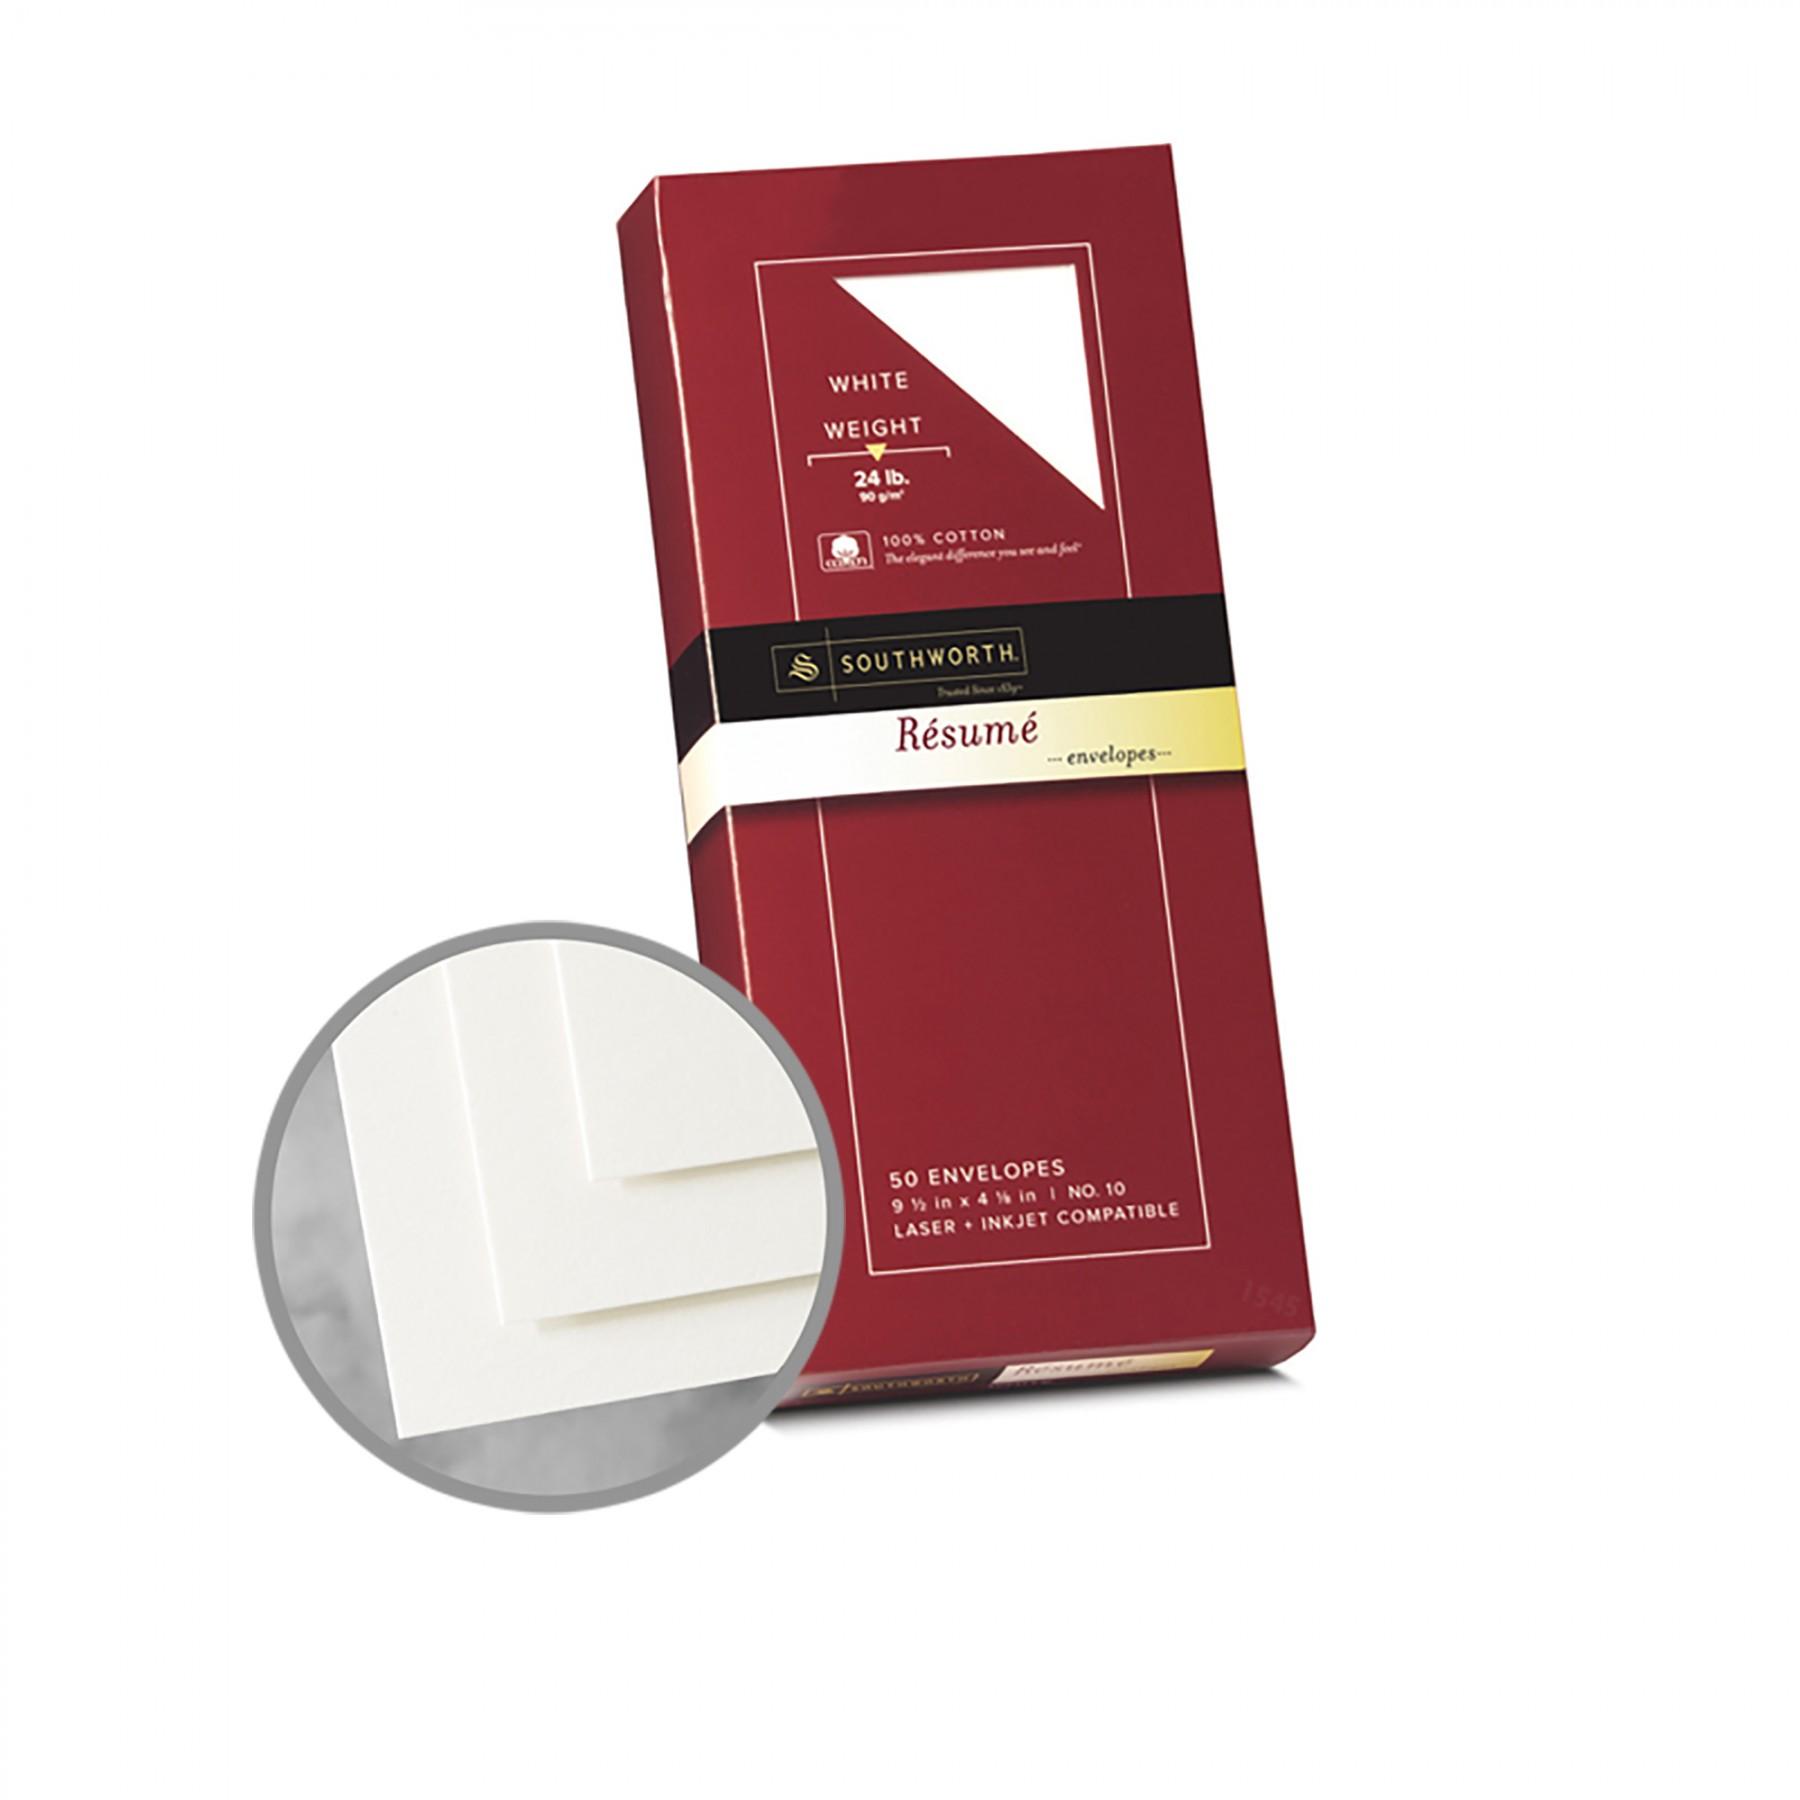 white envelopes no 10 commercial 4 1 8 x 9 1 2 24 lb